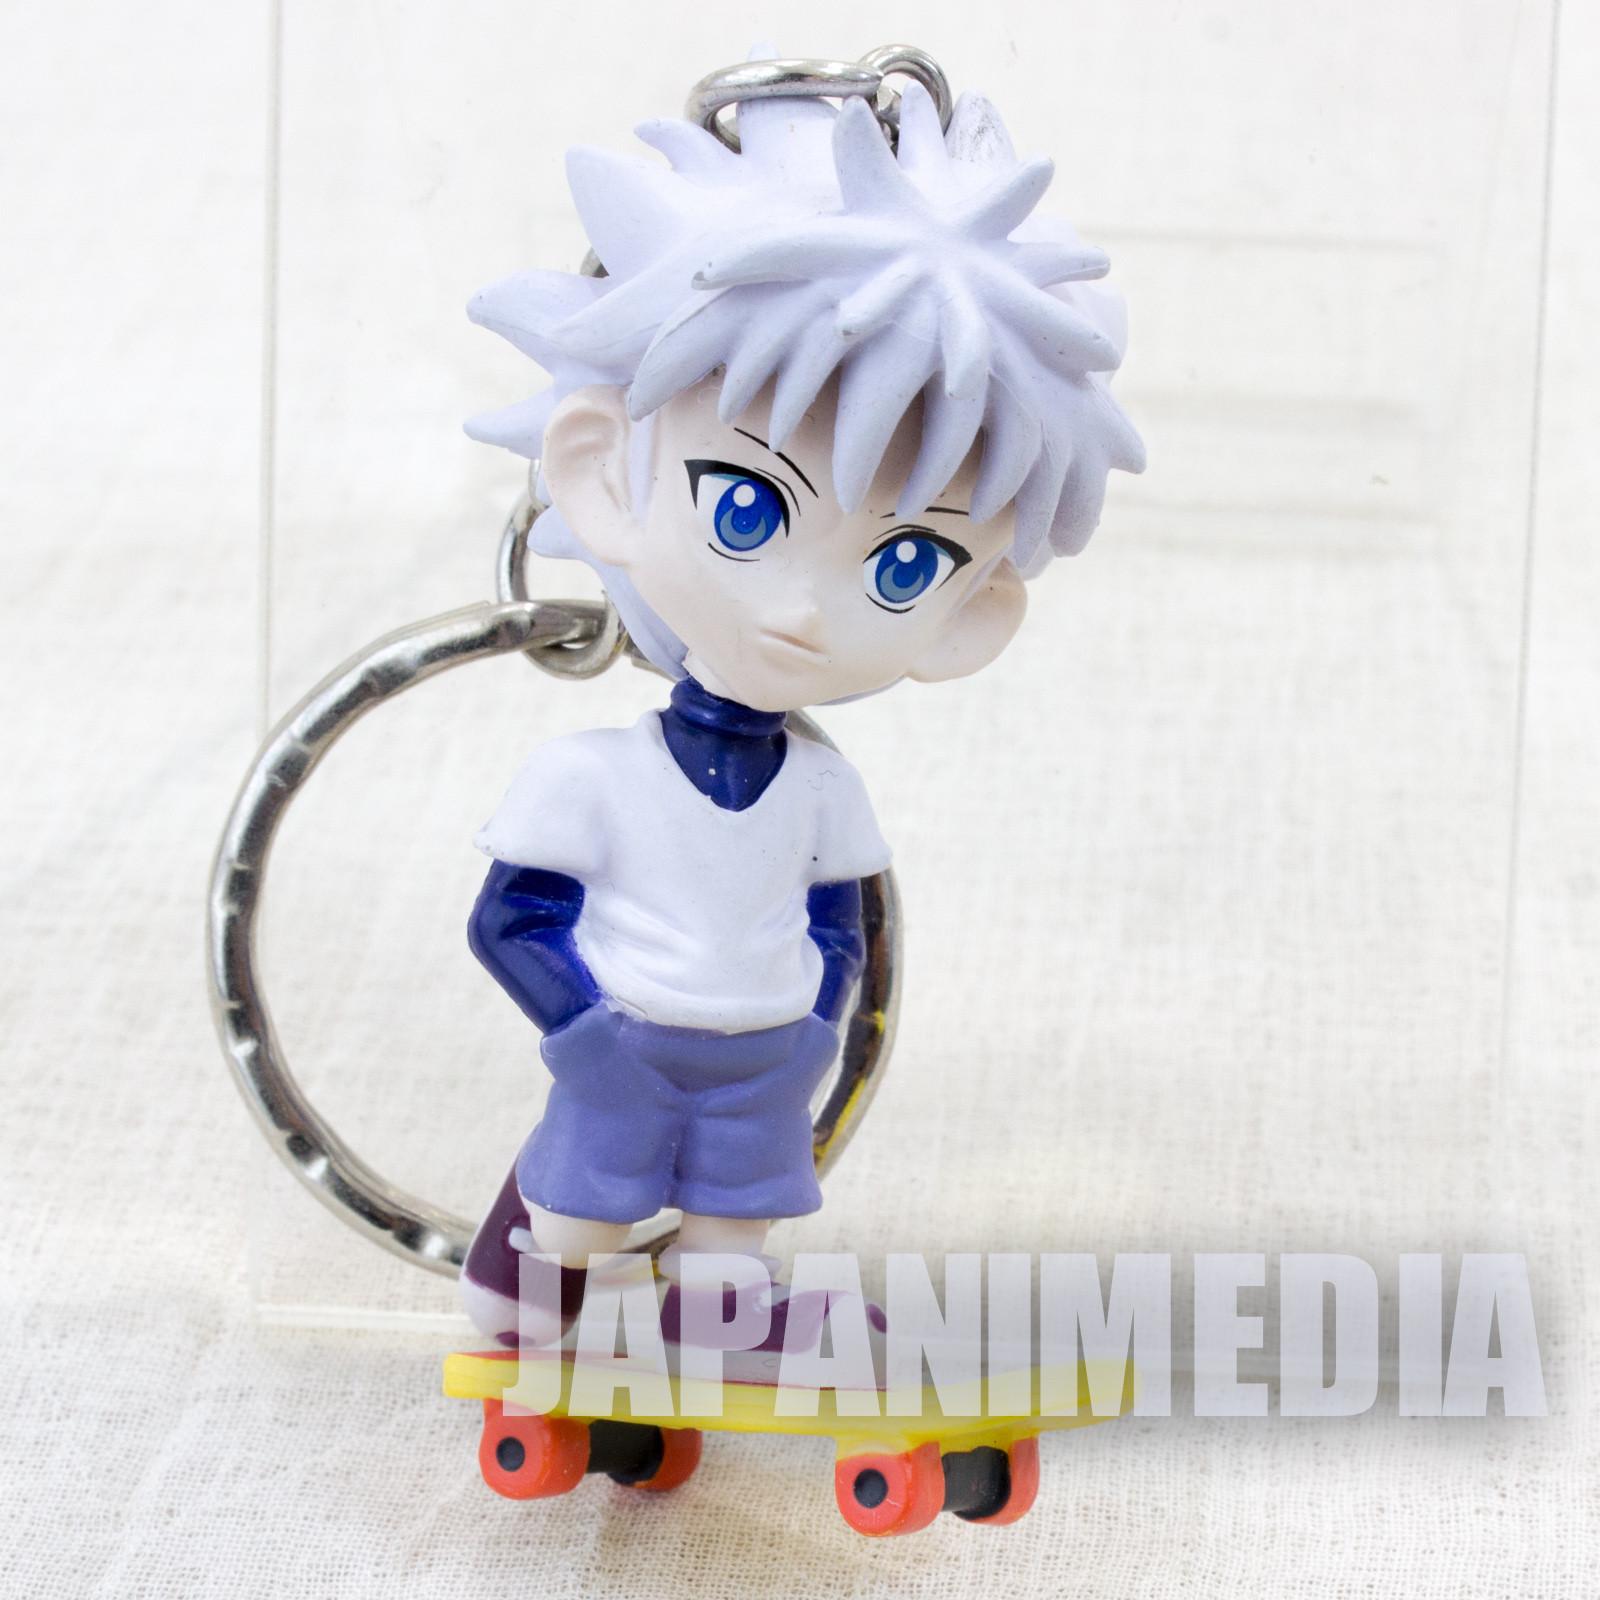 HUNTER x HUNTER Killua Mini Figure Key Holder Chain Banpresto JAPAN ANIME 3